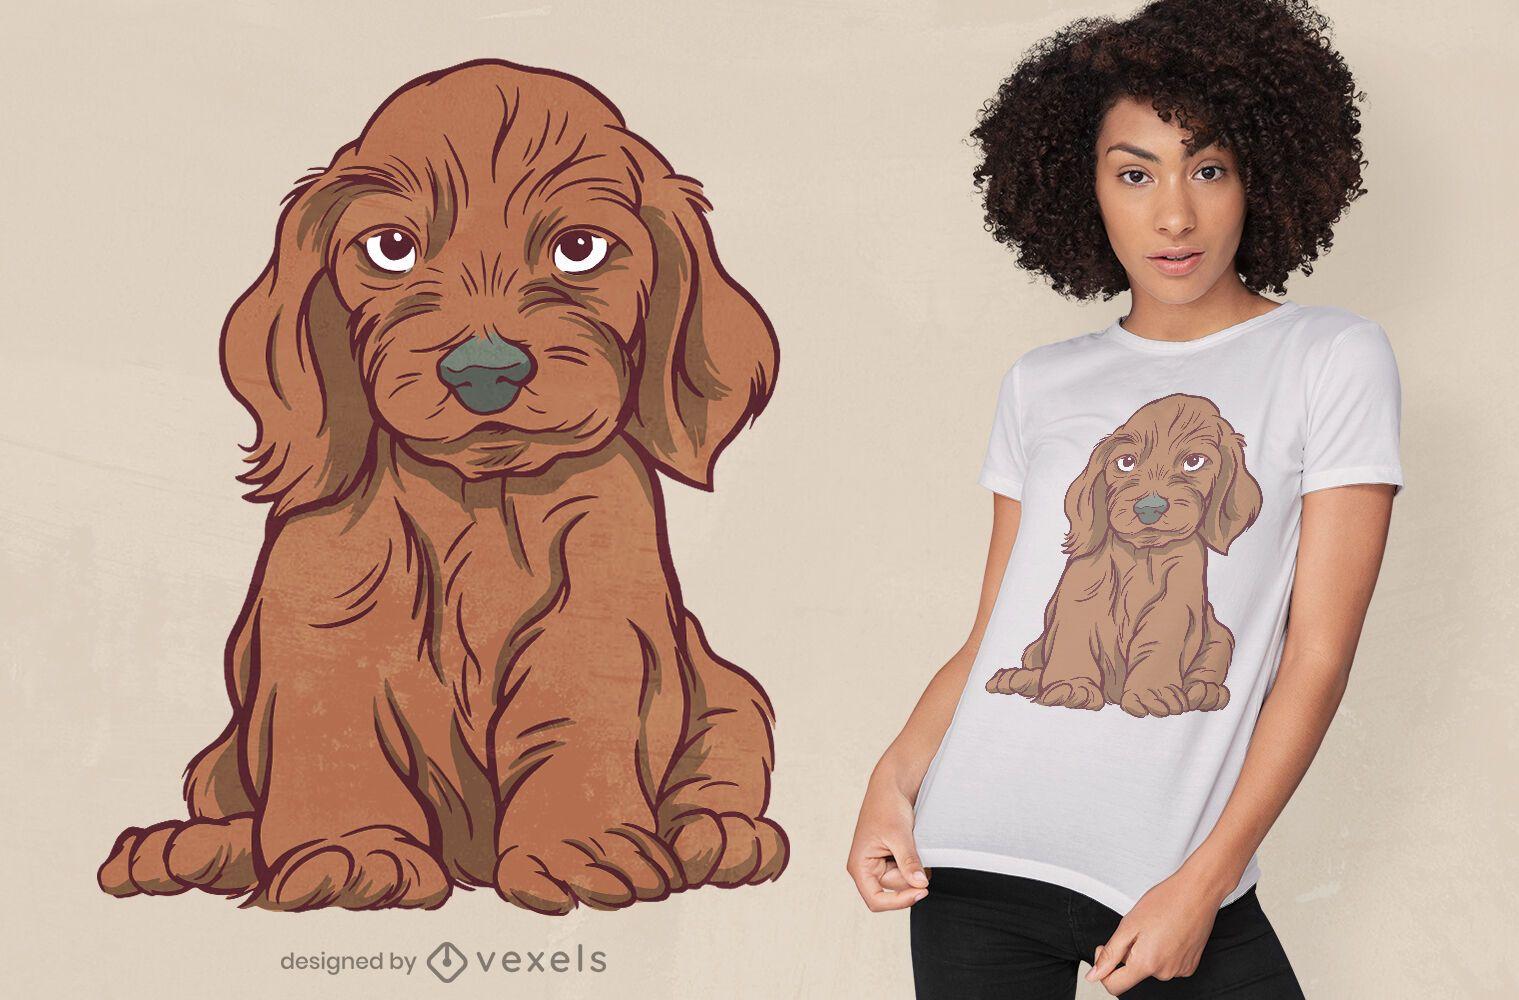 Dog dachshund t-shirt design